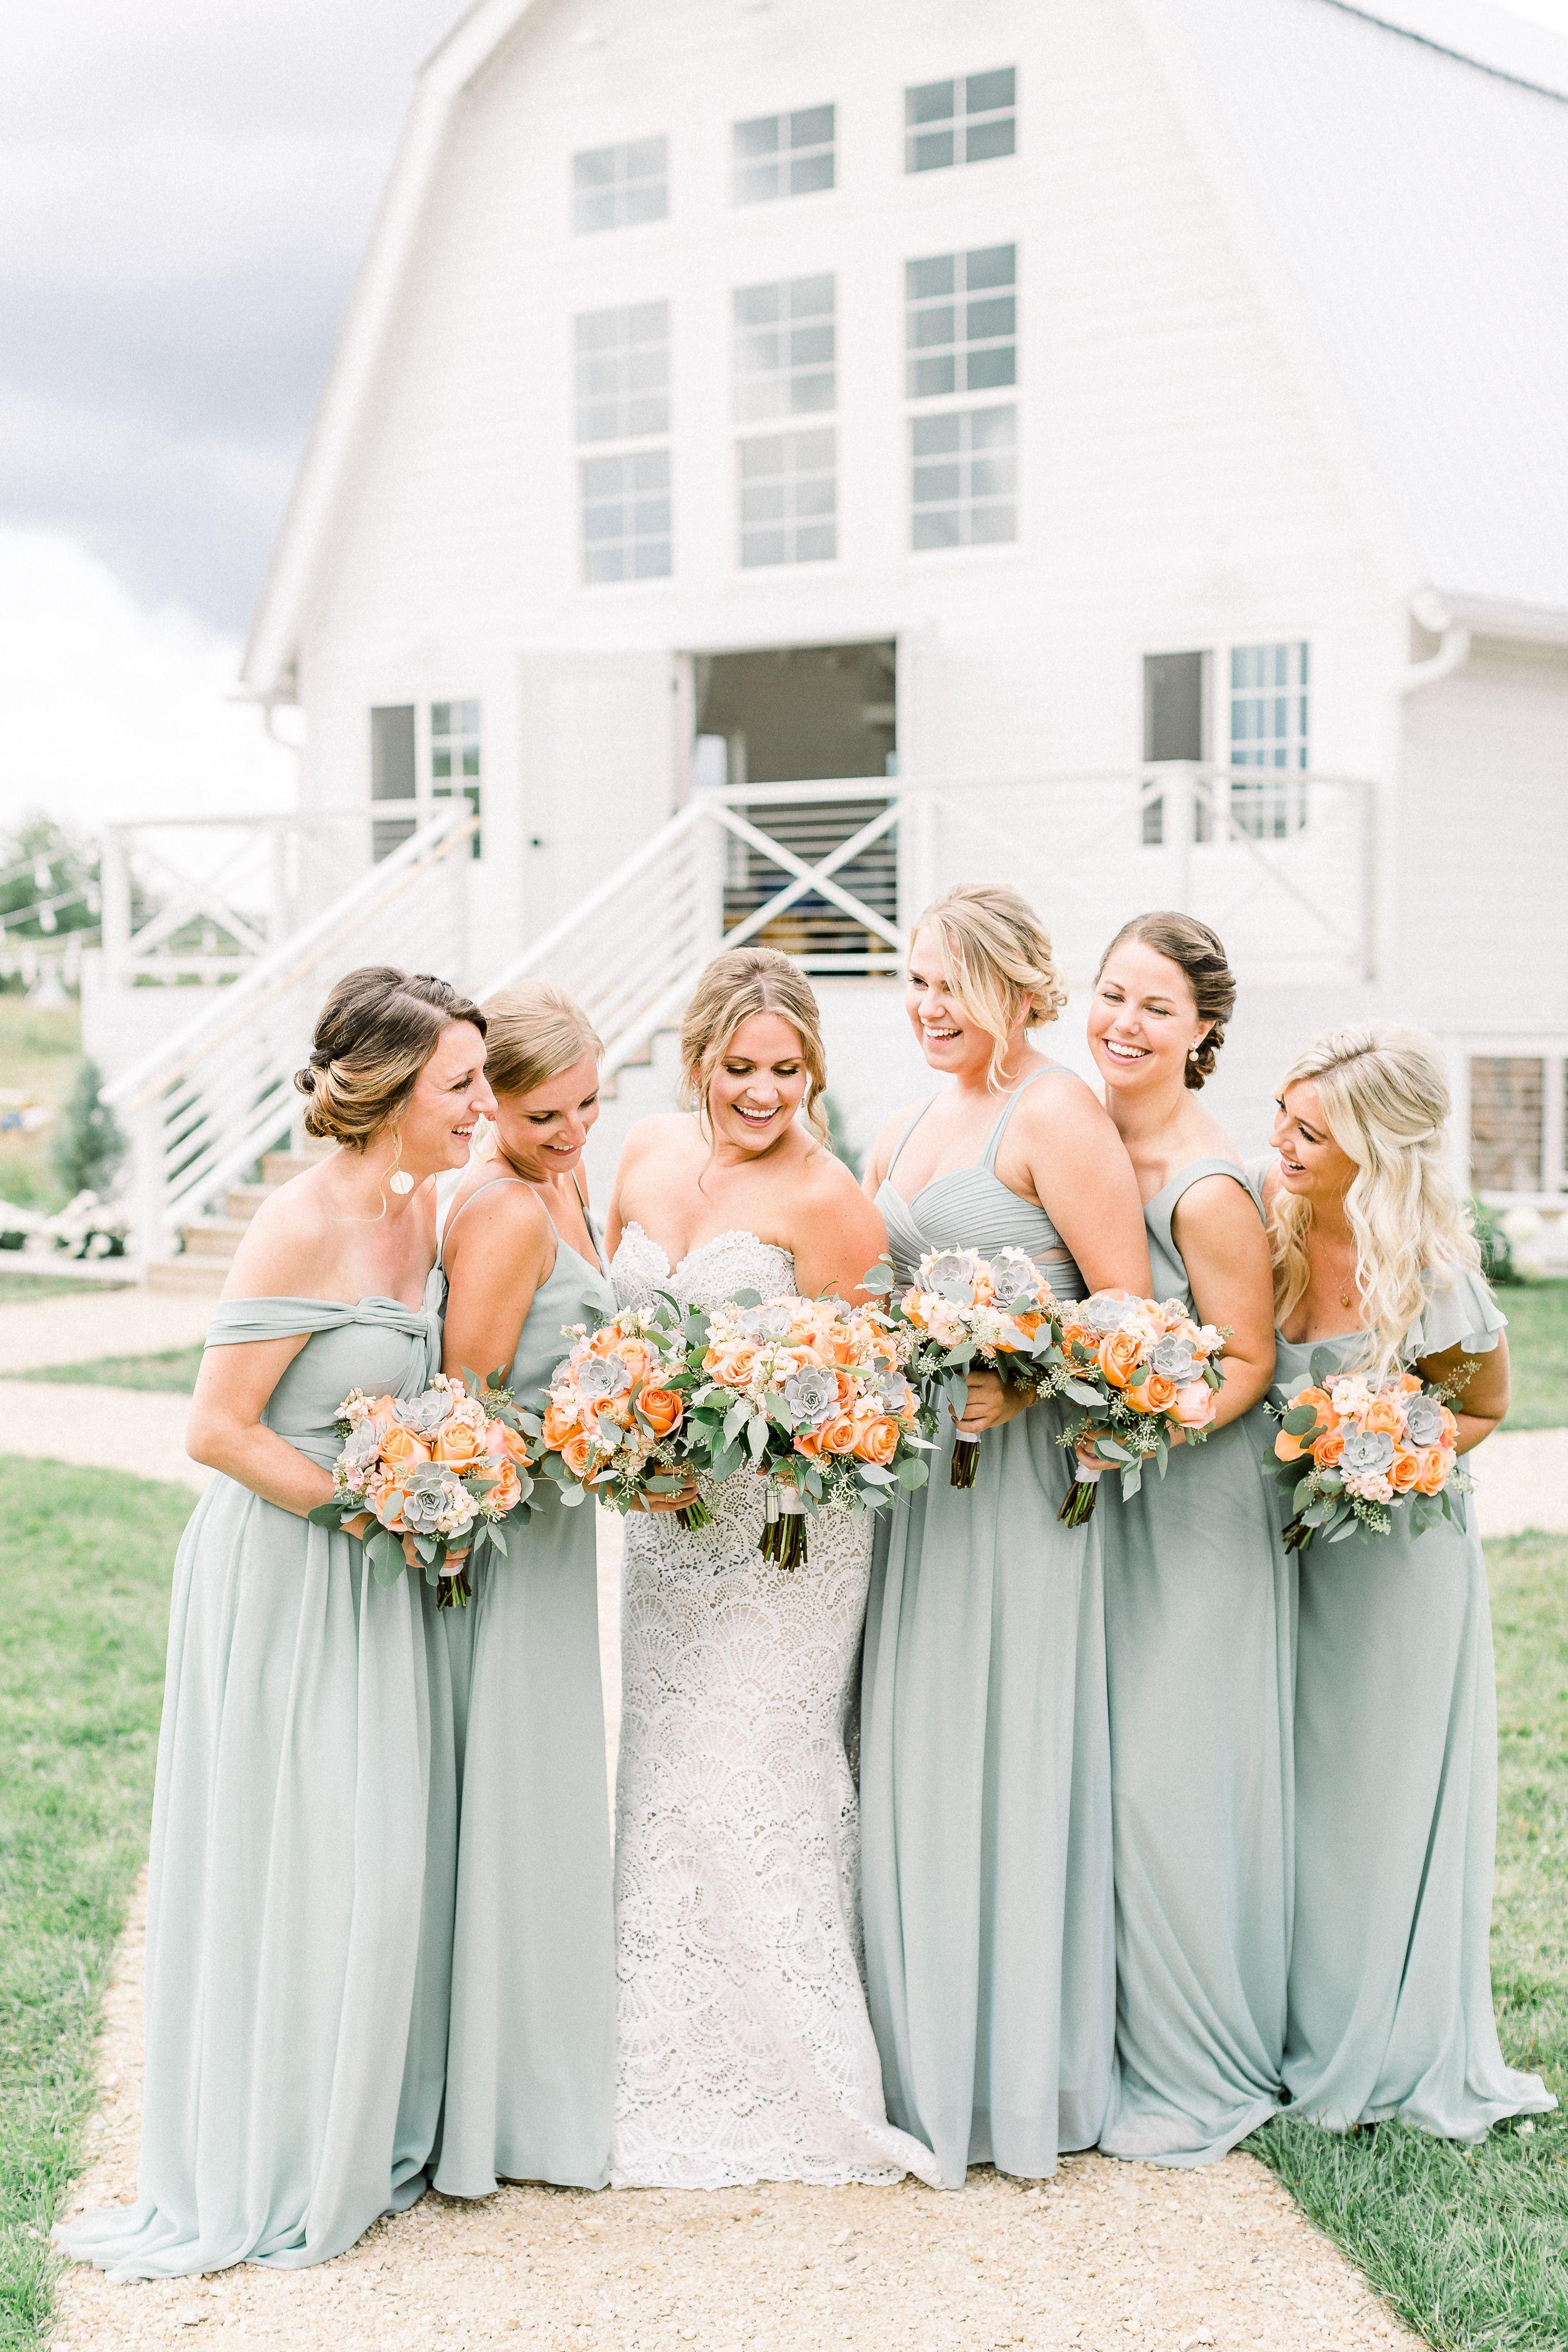 Sage Bridesmaid Dresses Sage Green Wedding Colors Sage Green Wedding Bridesmaid Sage Green Bridesmaid Dress [ 4000 x 2667 Pixel ]